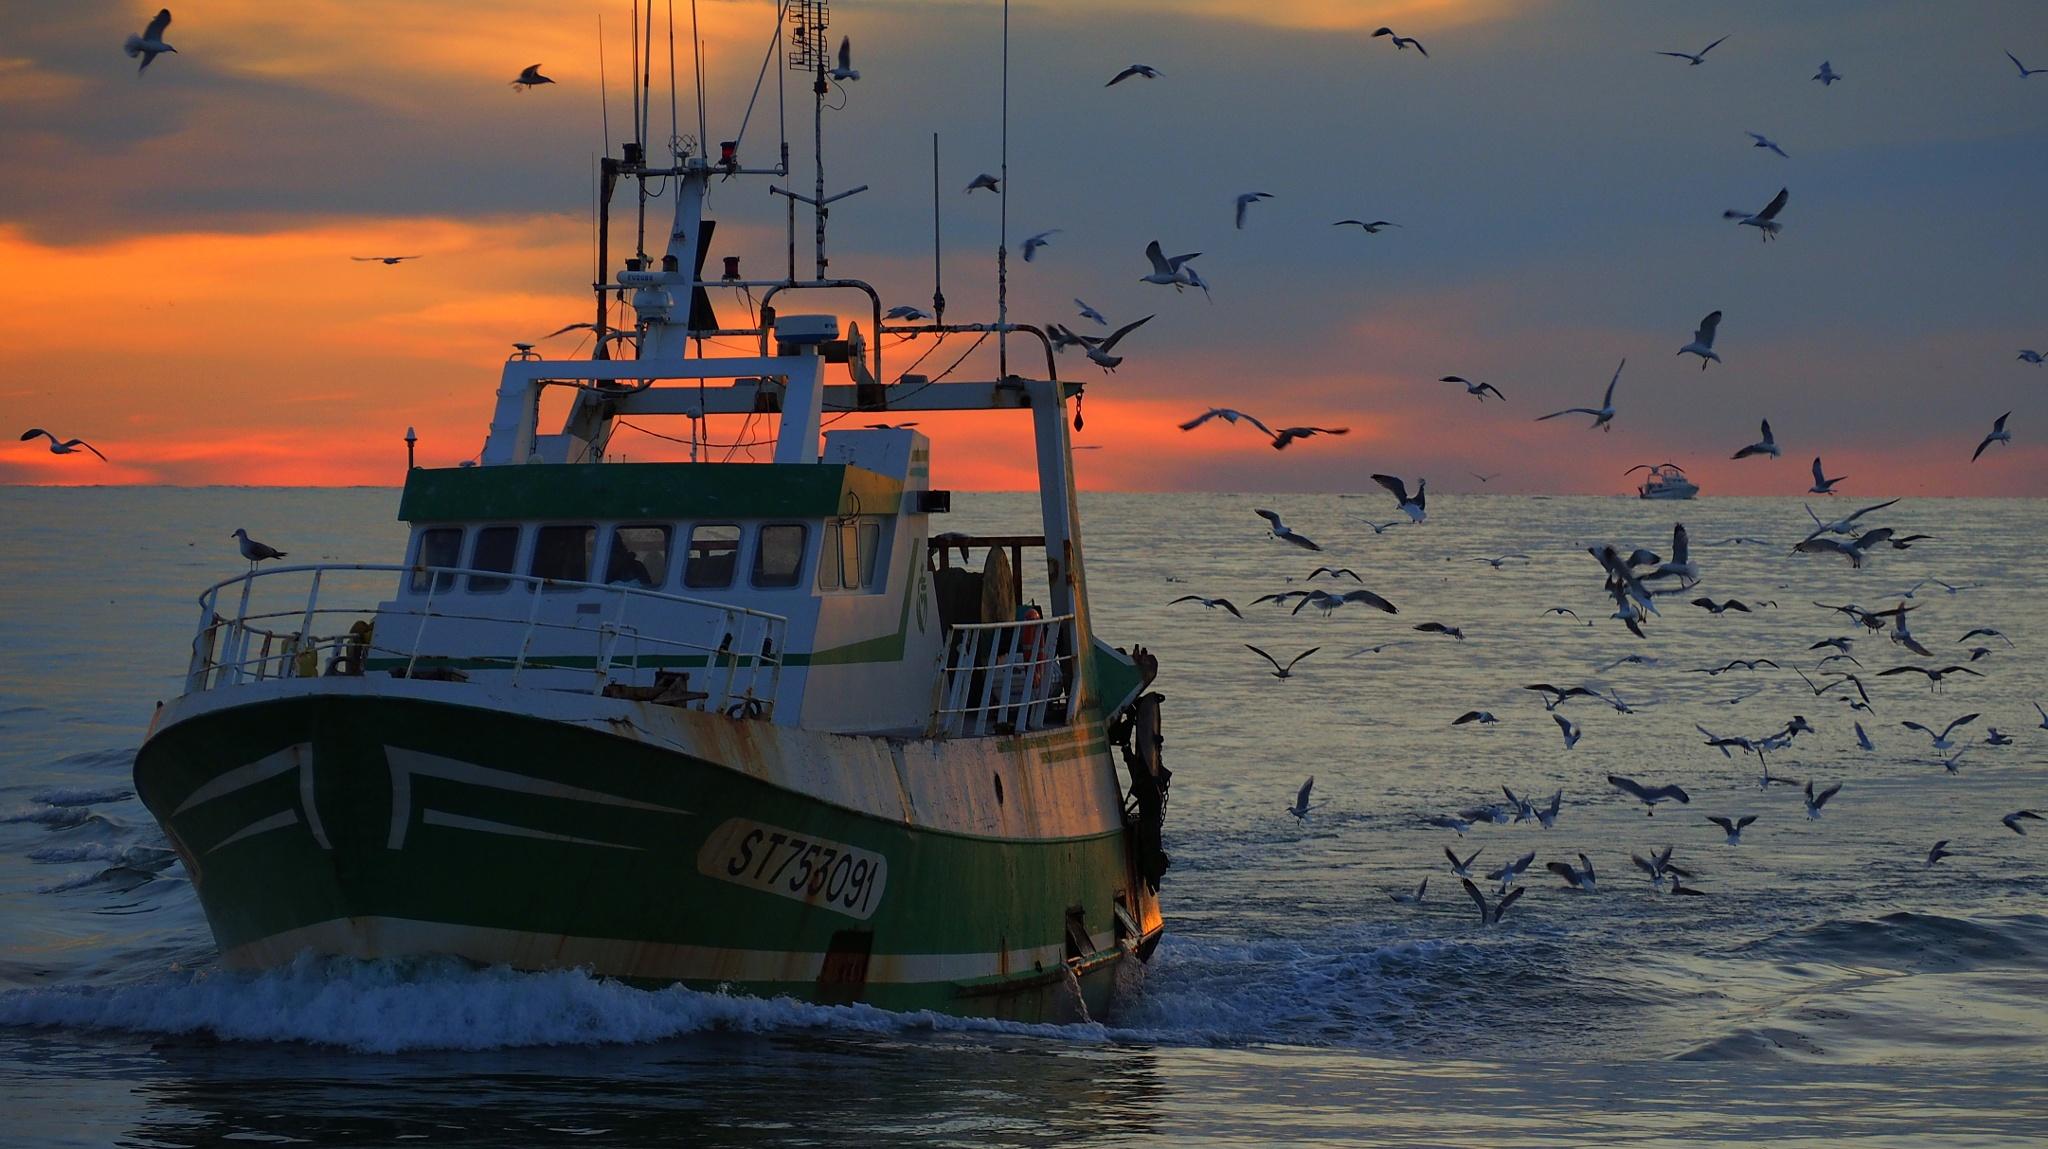 return of trawlers by alain michel